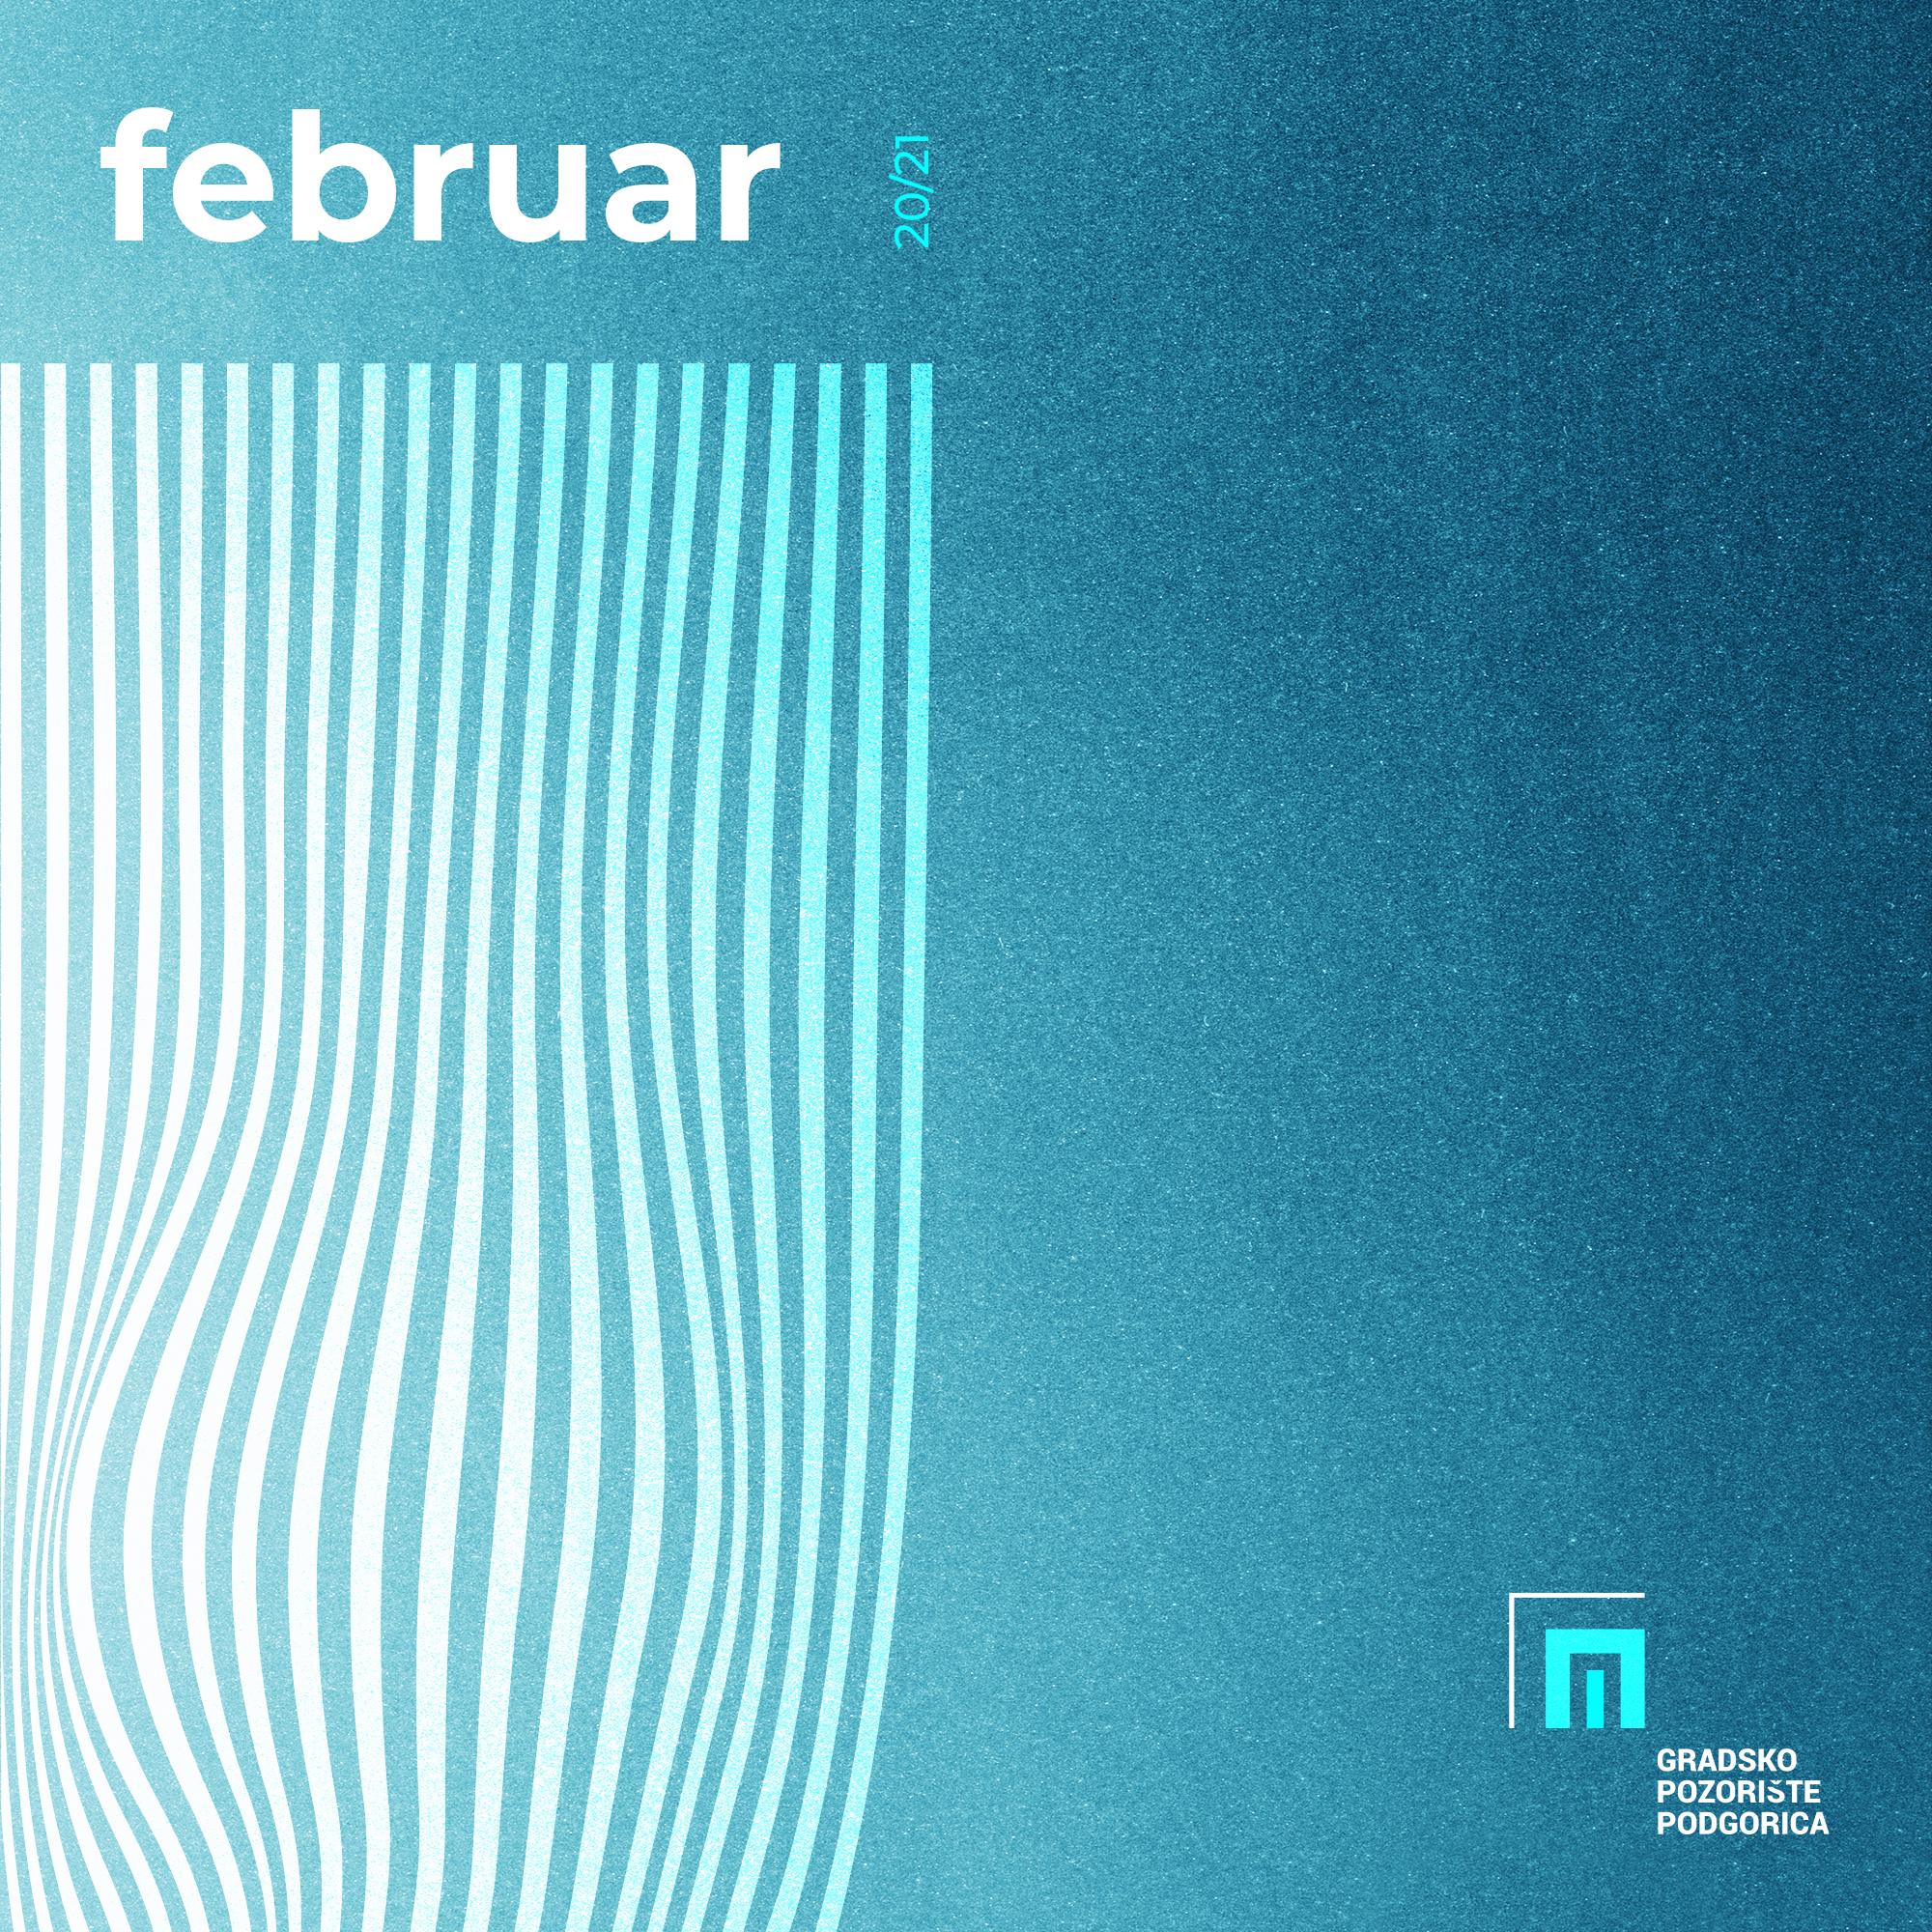 Repertoar za februar